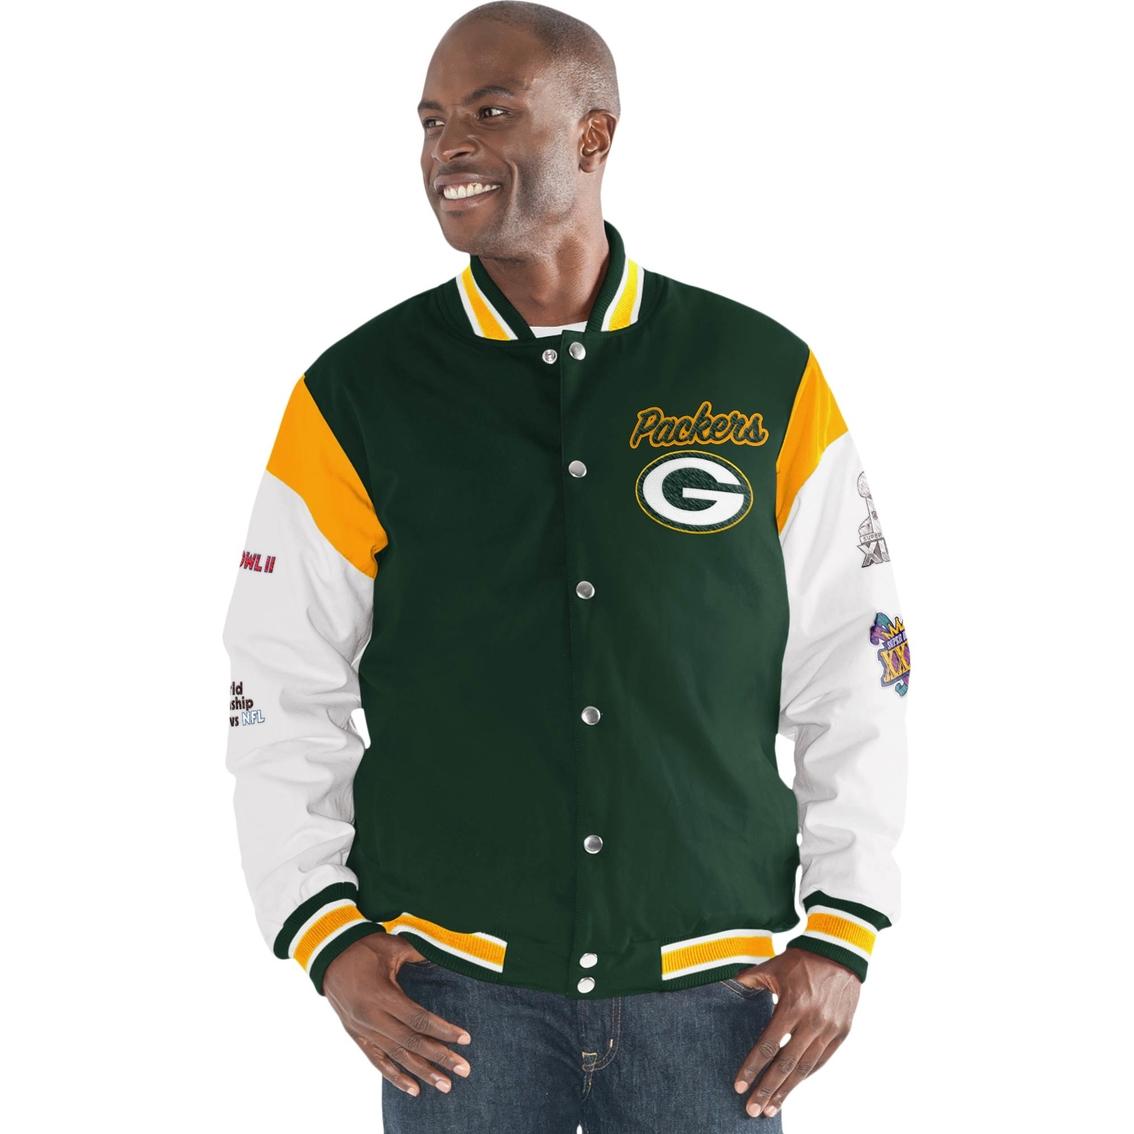 new product c647f b674c G-iii Sports Nfl Green Bay Packers Team Elite Commemorative ...